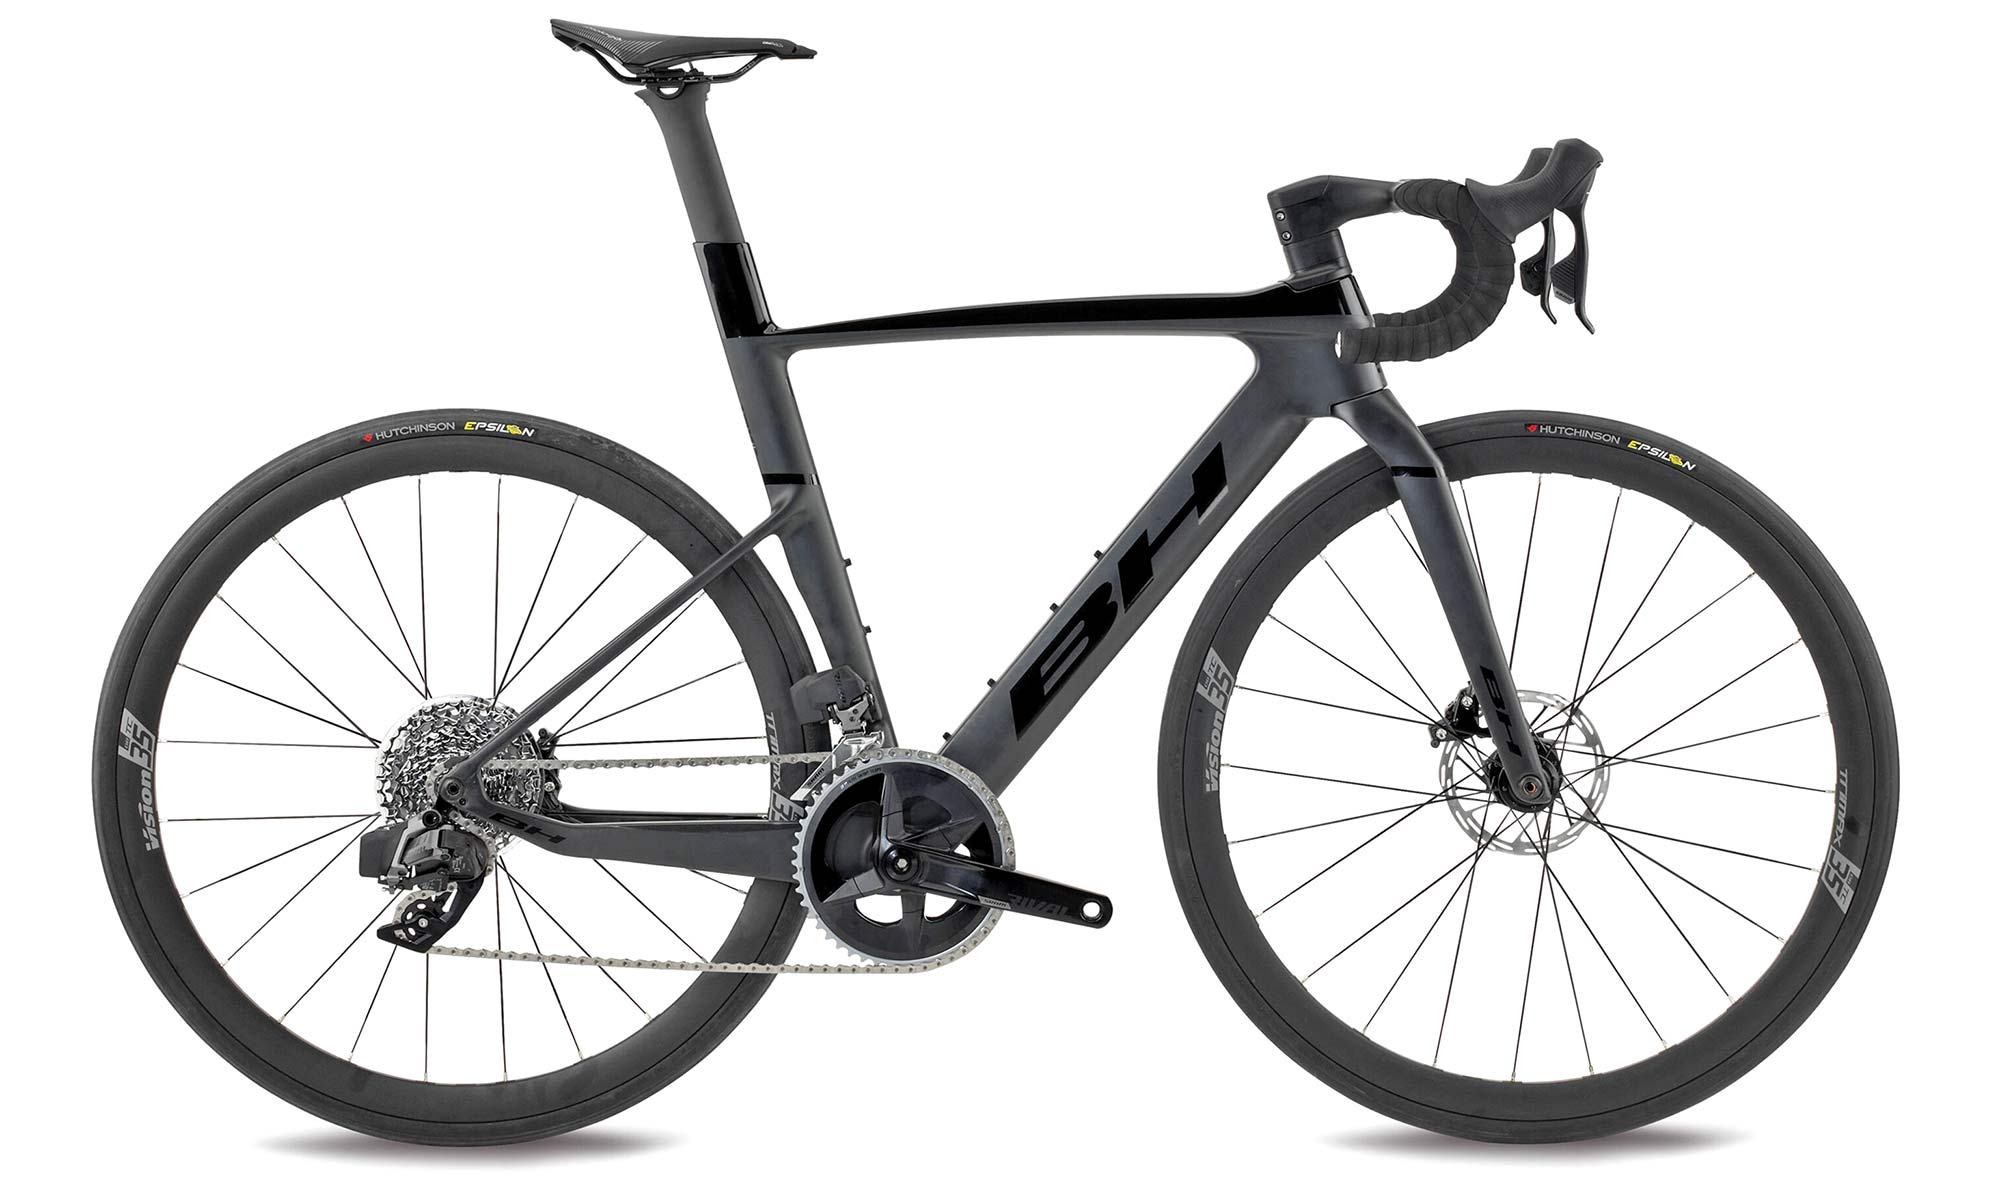 2022 BH Aerolight lightweight aero carbon all-rounder road bike,6 complete